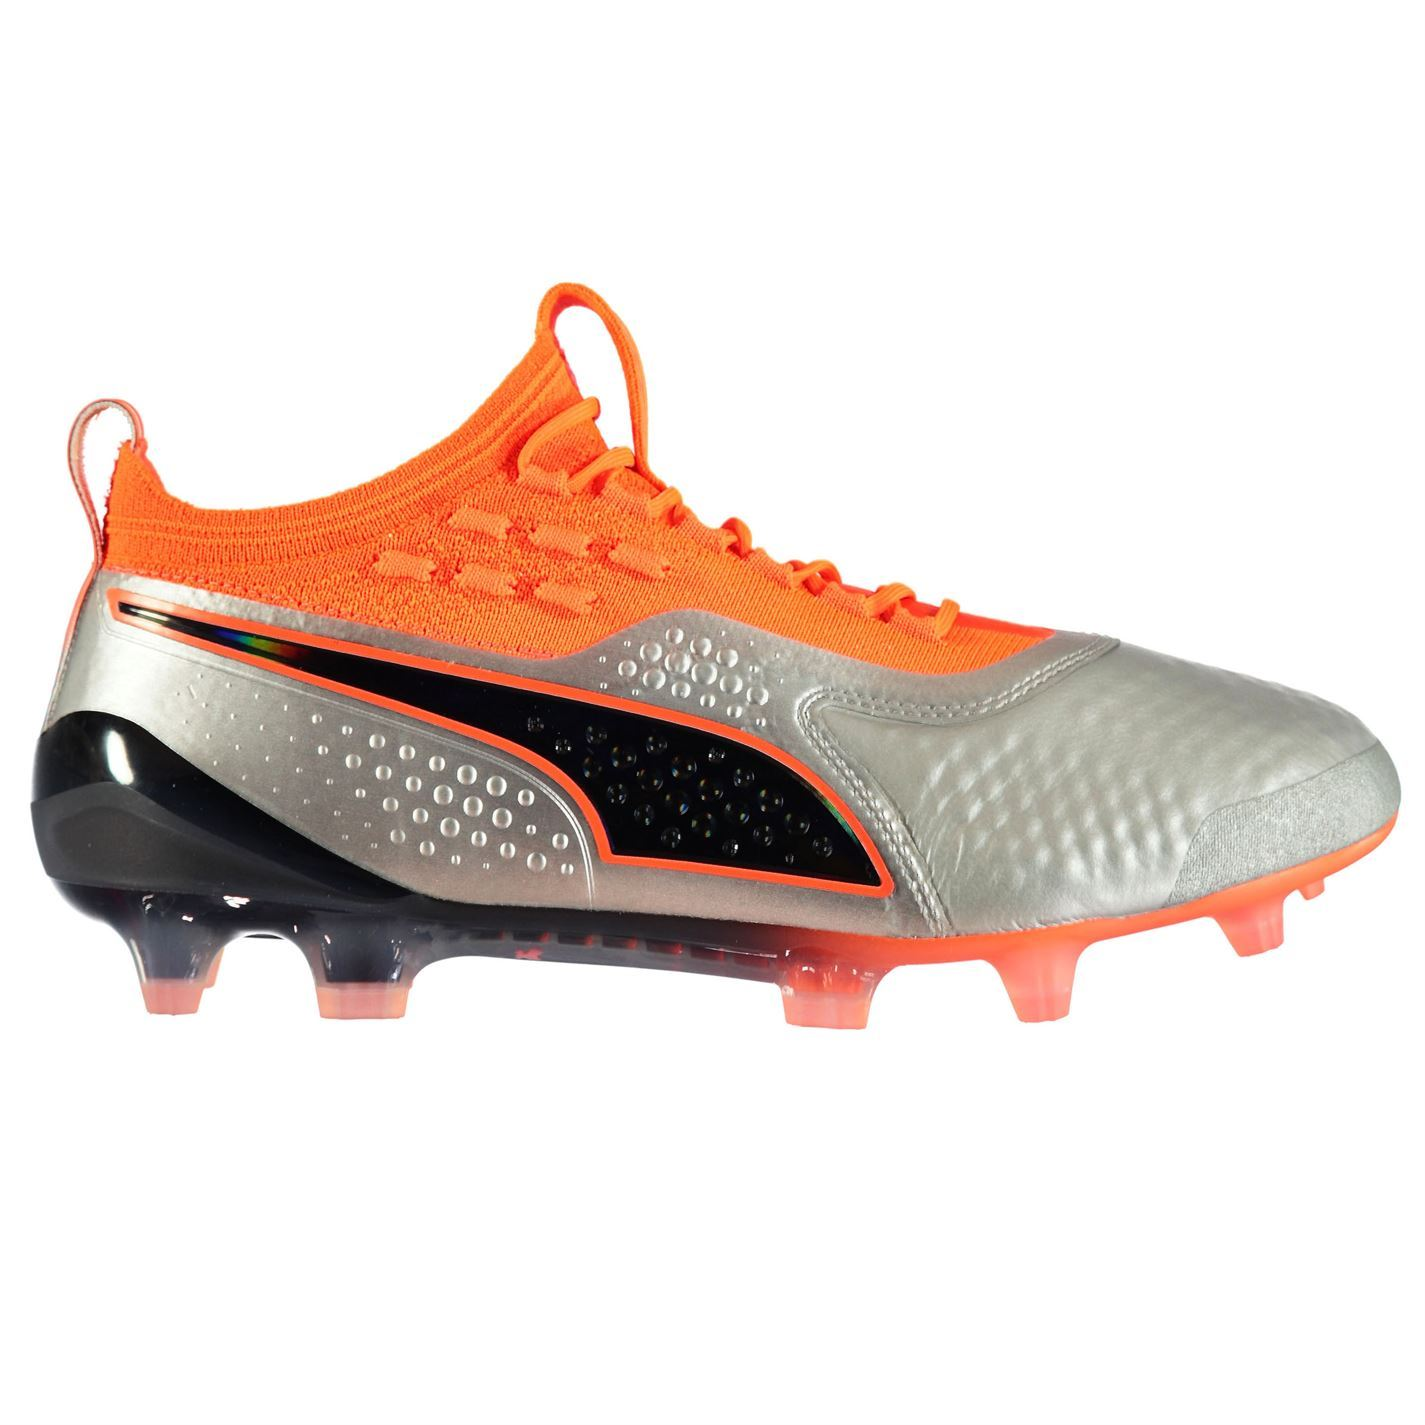 miniature 3 - PUMA 1 Fg Firm Ground Chaussures De Football Homme Football Chaussures Crampons